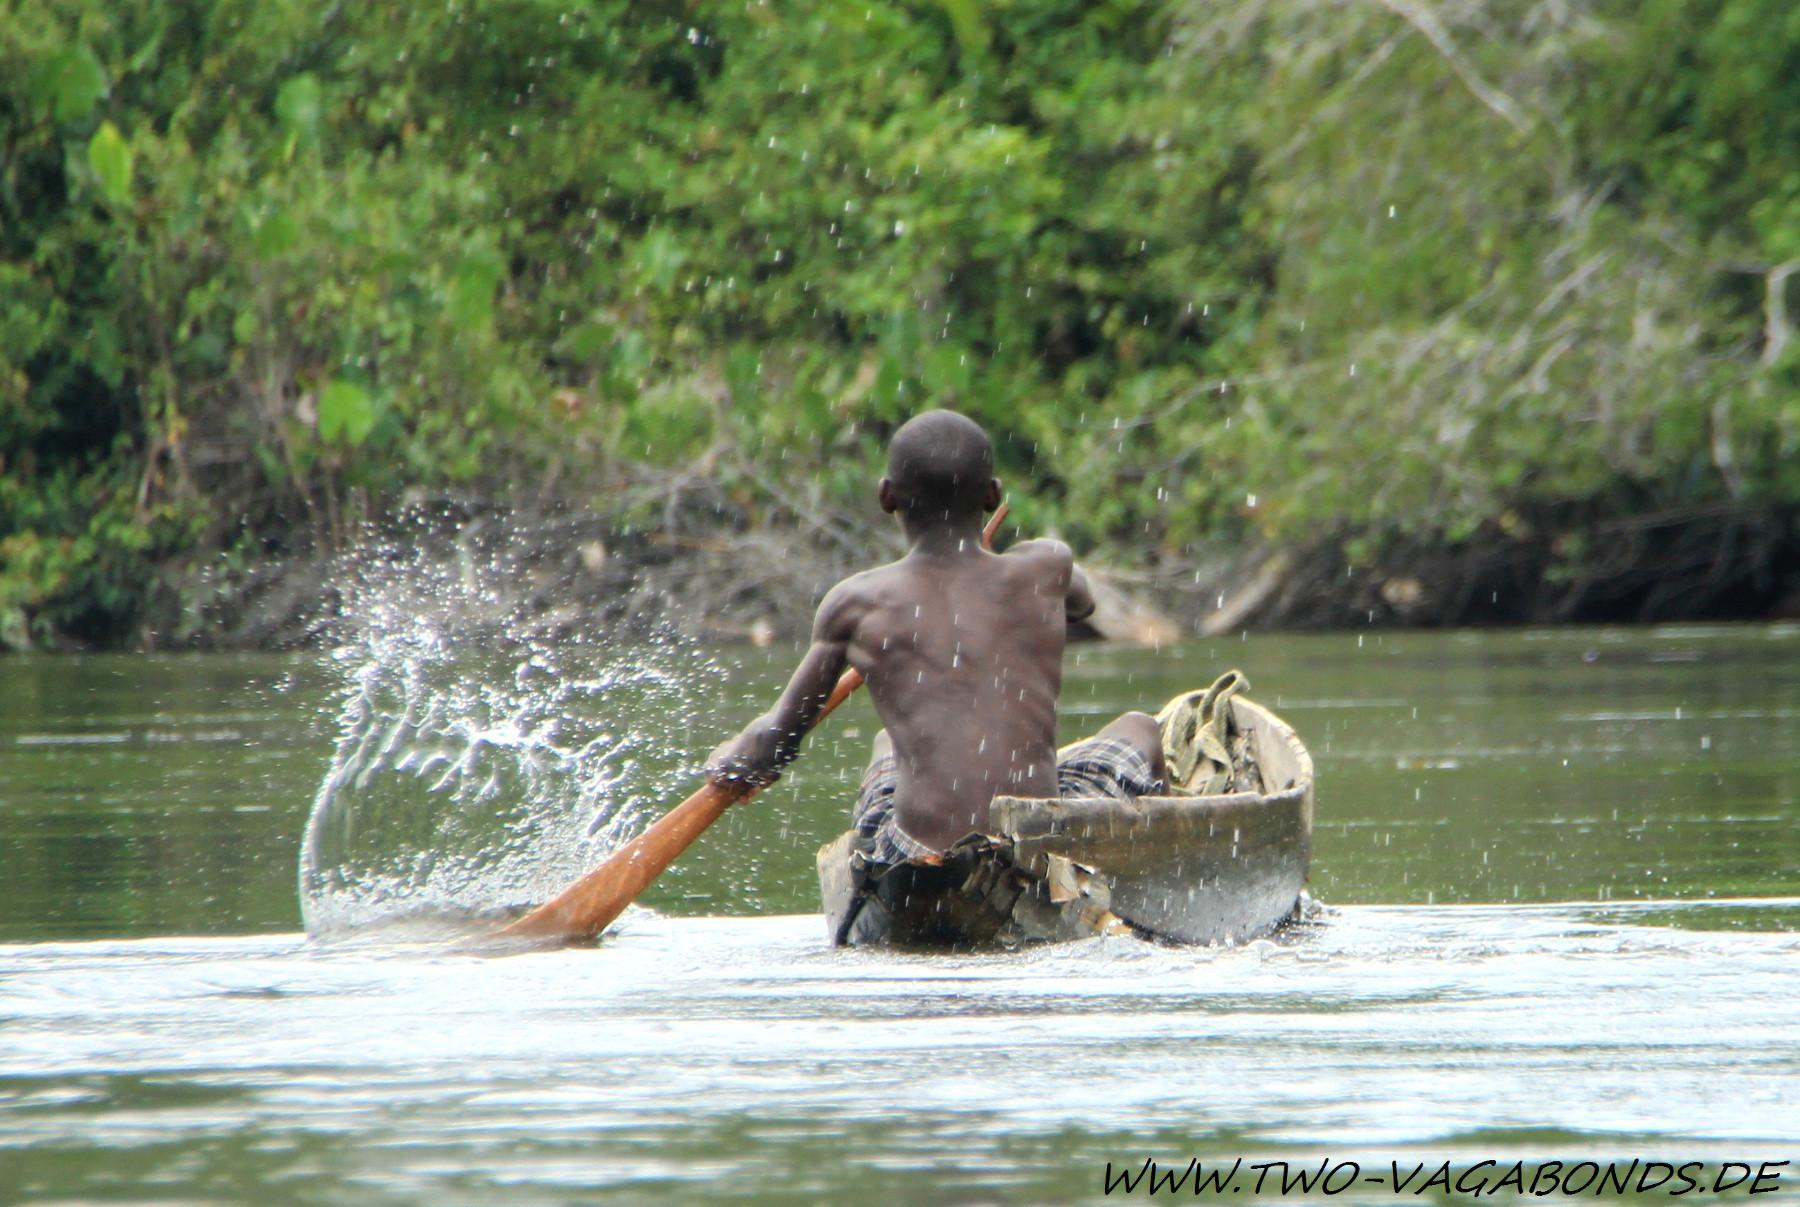 SURINAME 2014 - AMAZONAS